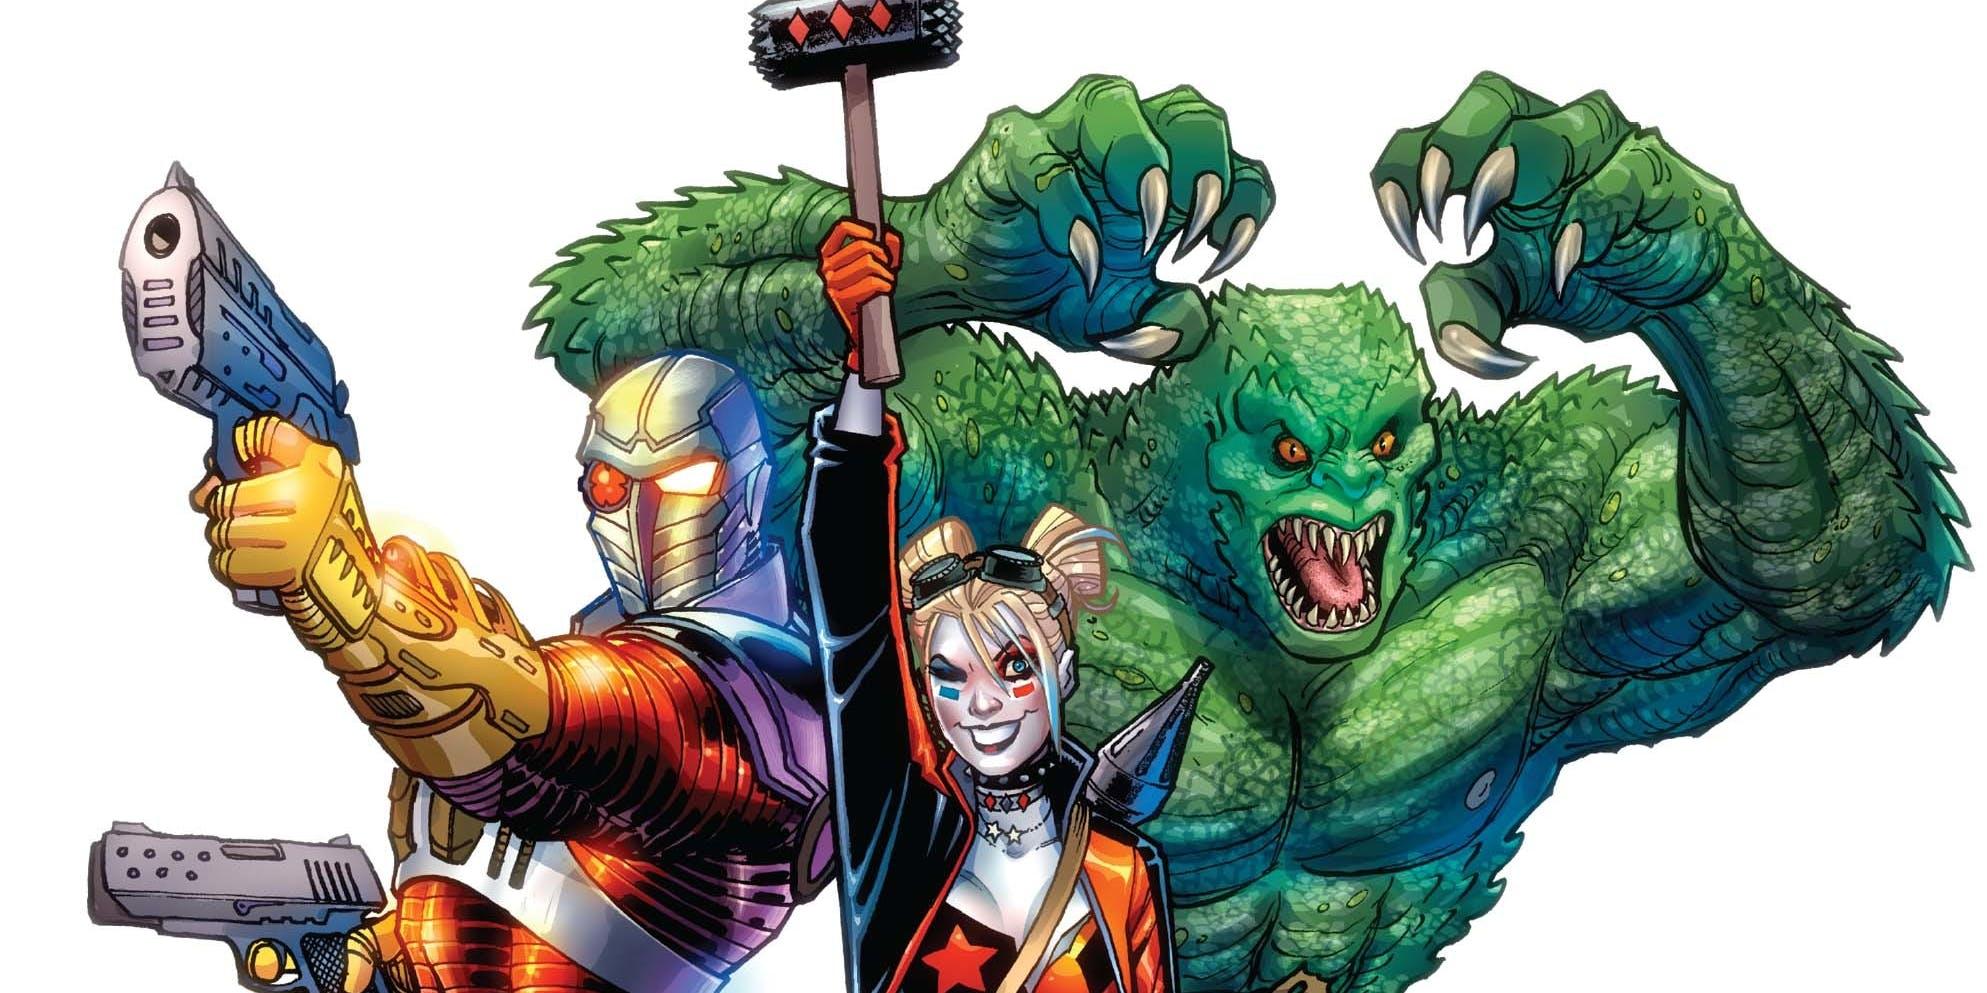 Harley Quinn Enrages Obama In DC's 'Suicide Squad' Rebirth